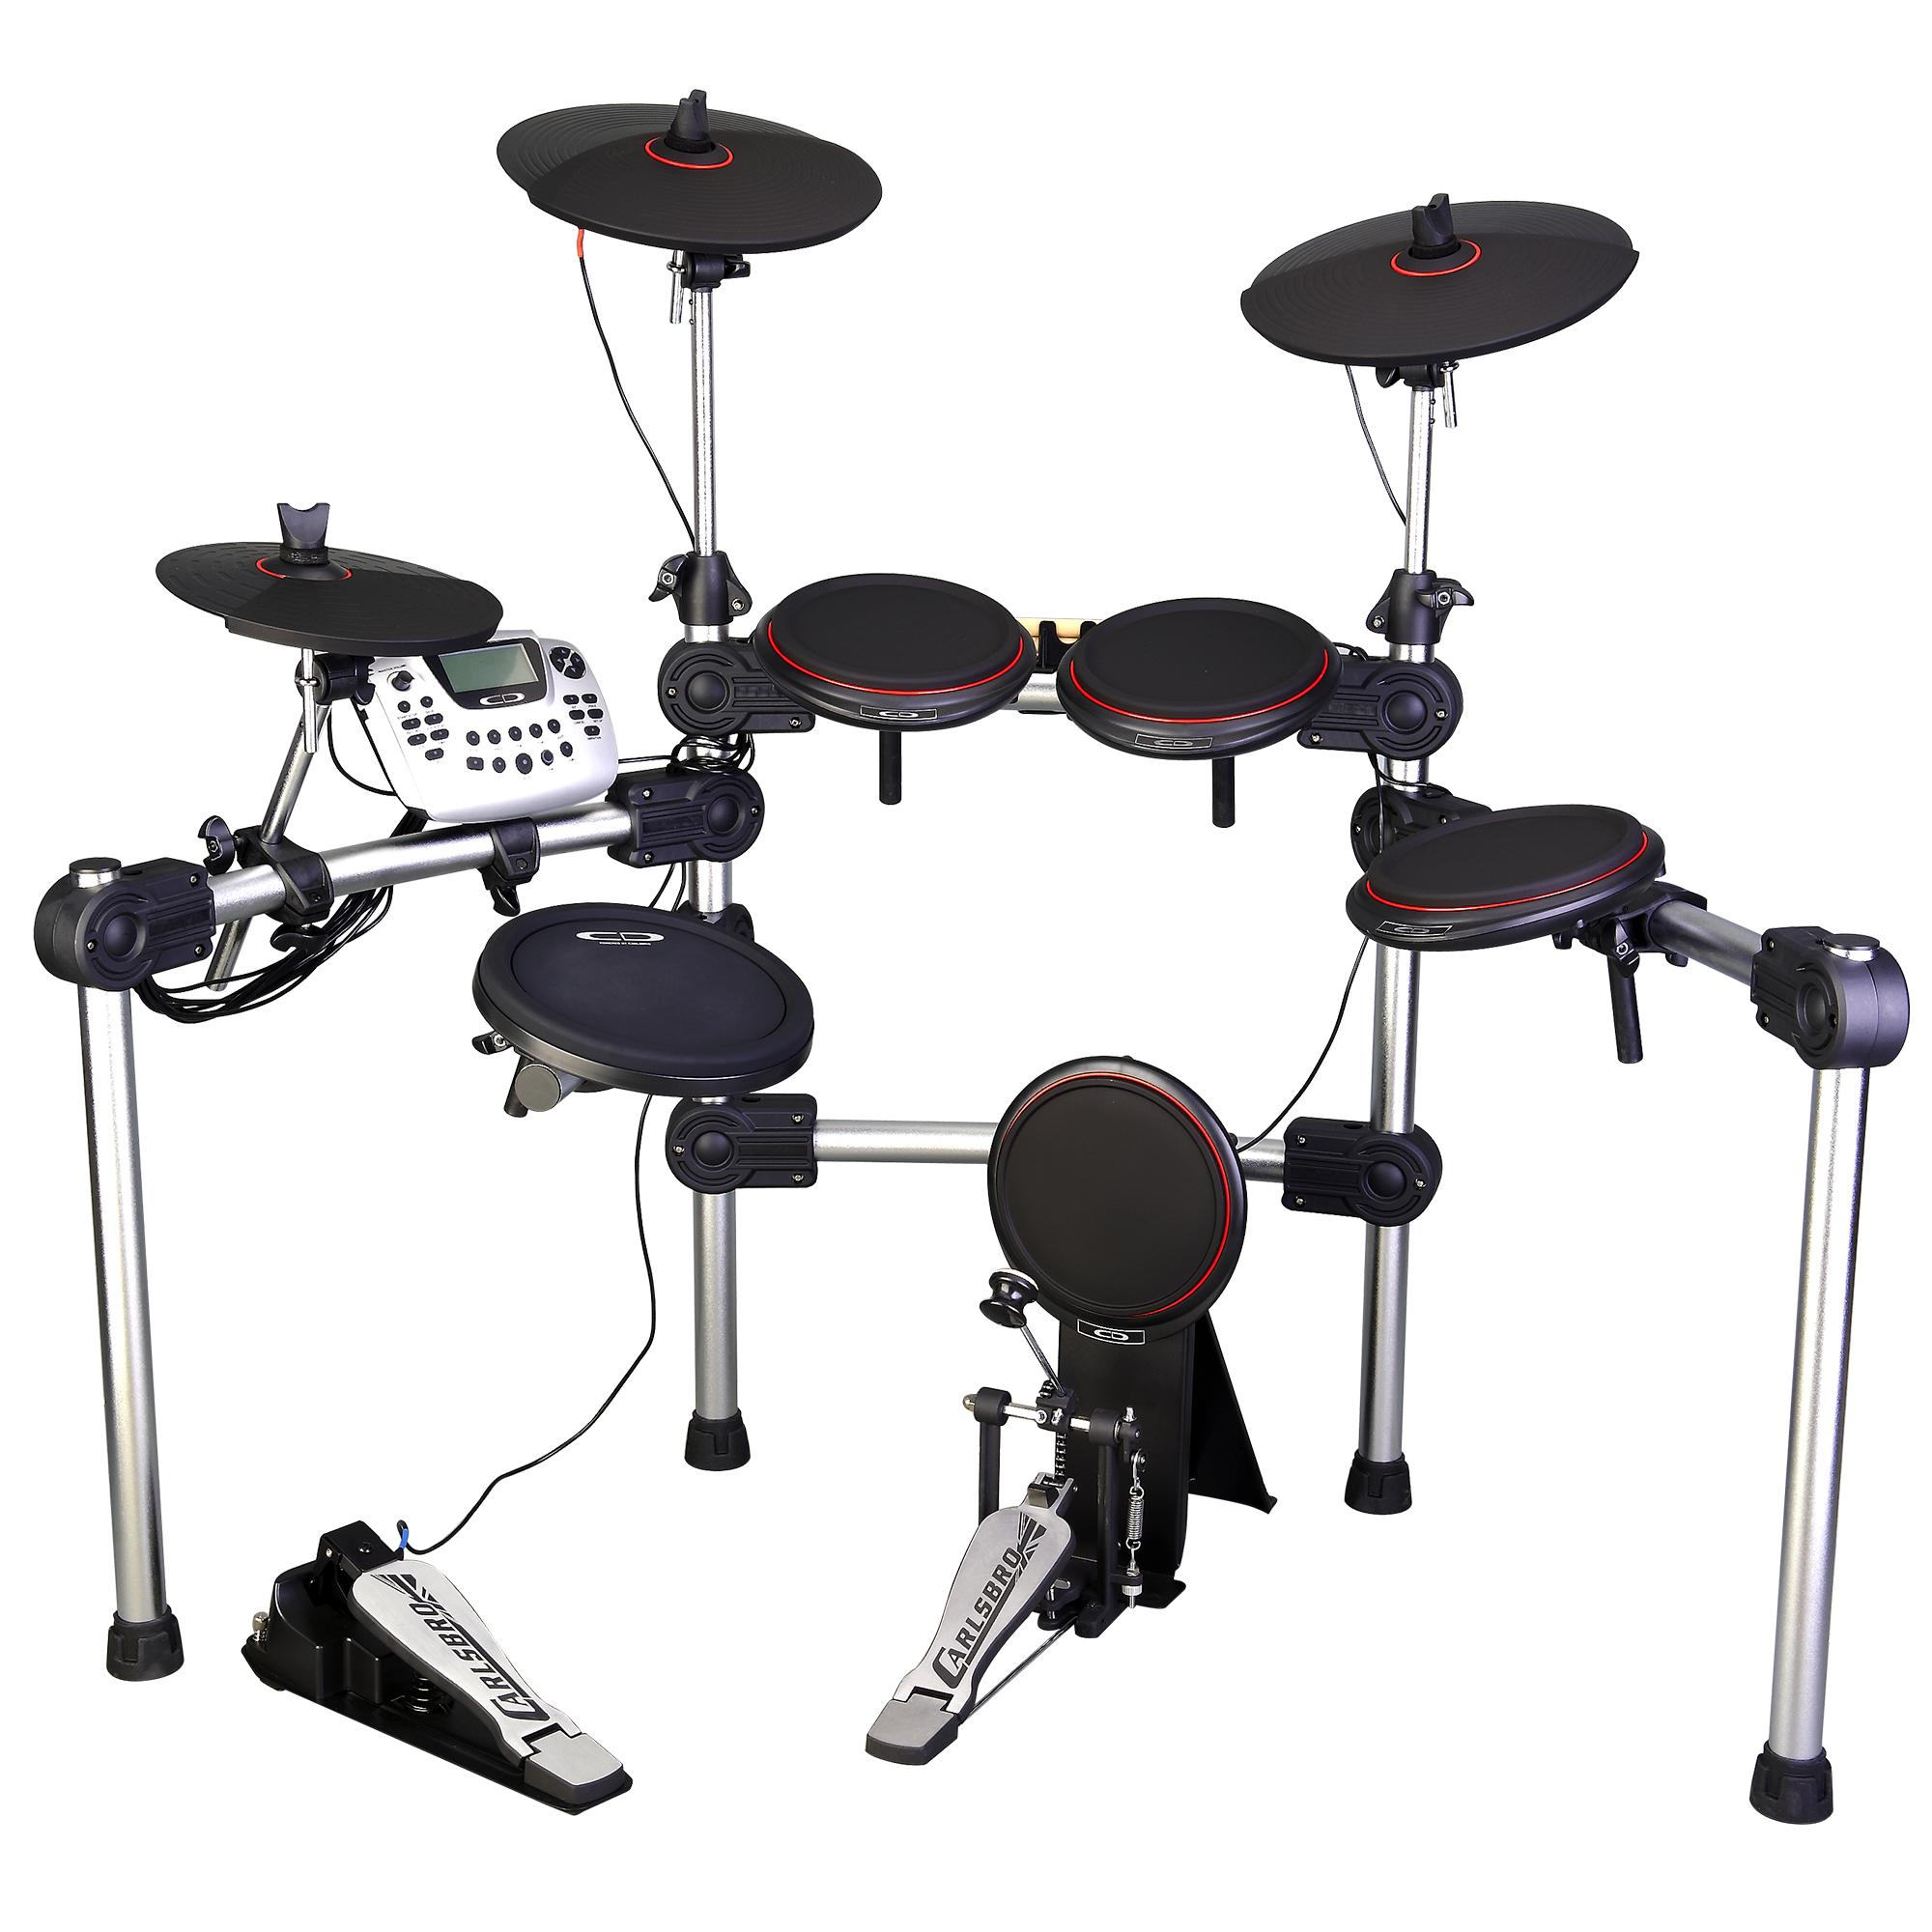 CARLSBRO CSD210 8 Piece Electronic Drum Kit